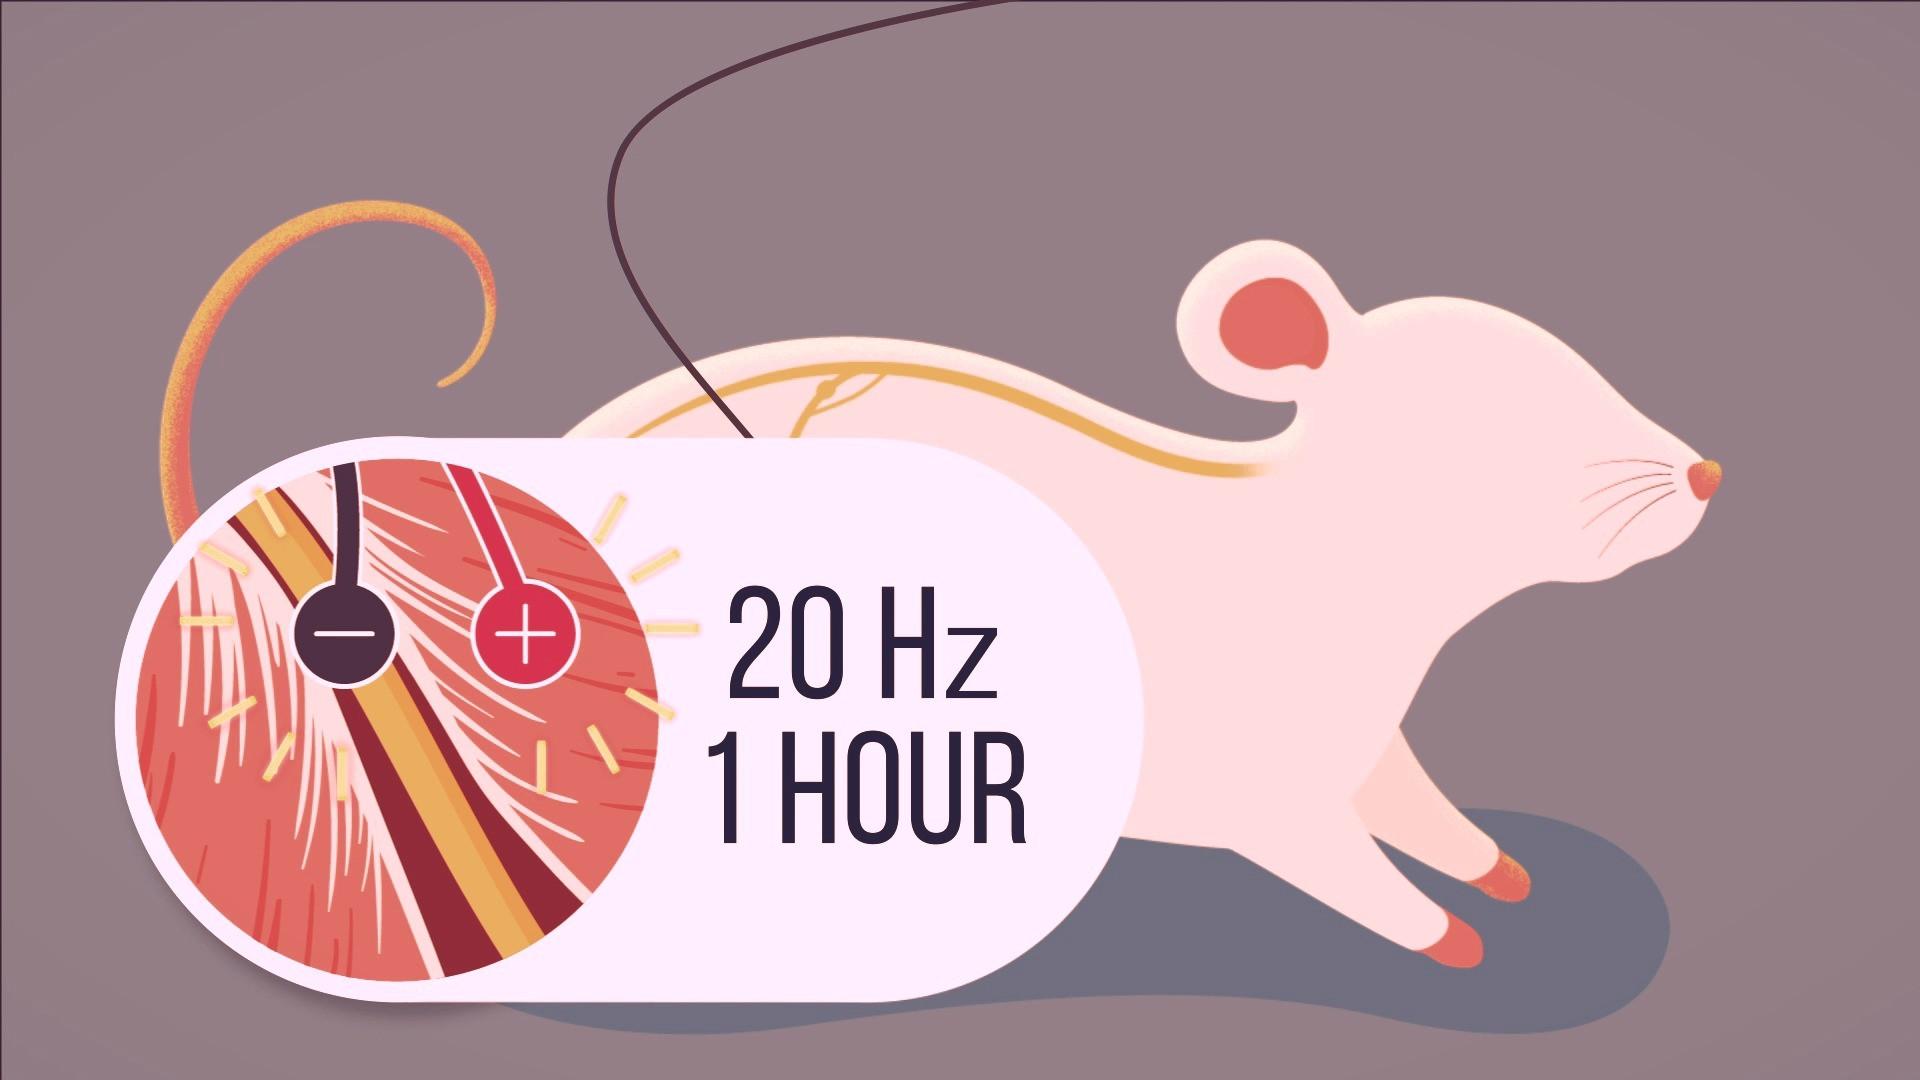 2D Medical Animation 메디컬 애니메이션 의학 바이오 3D 영상